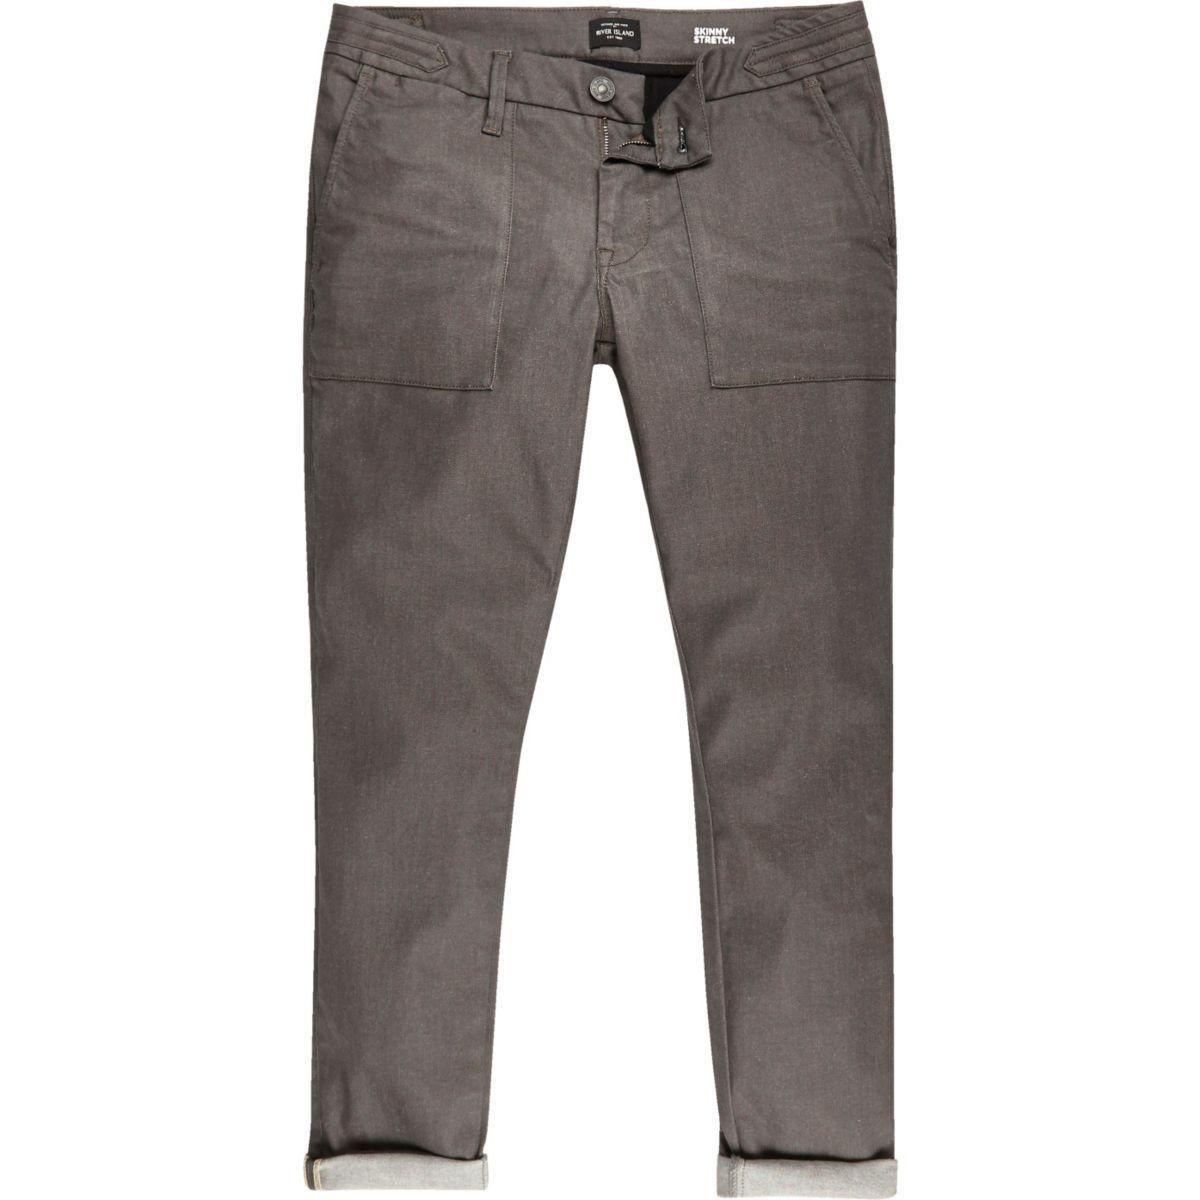 Sid – Umgeschlagene Skinny Jeans in Braun